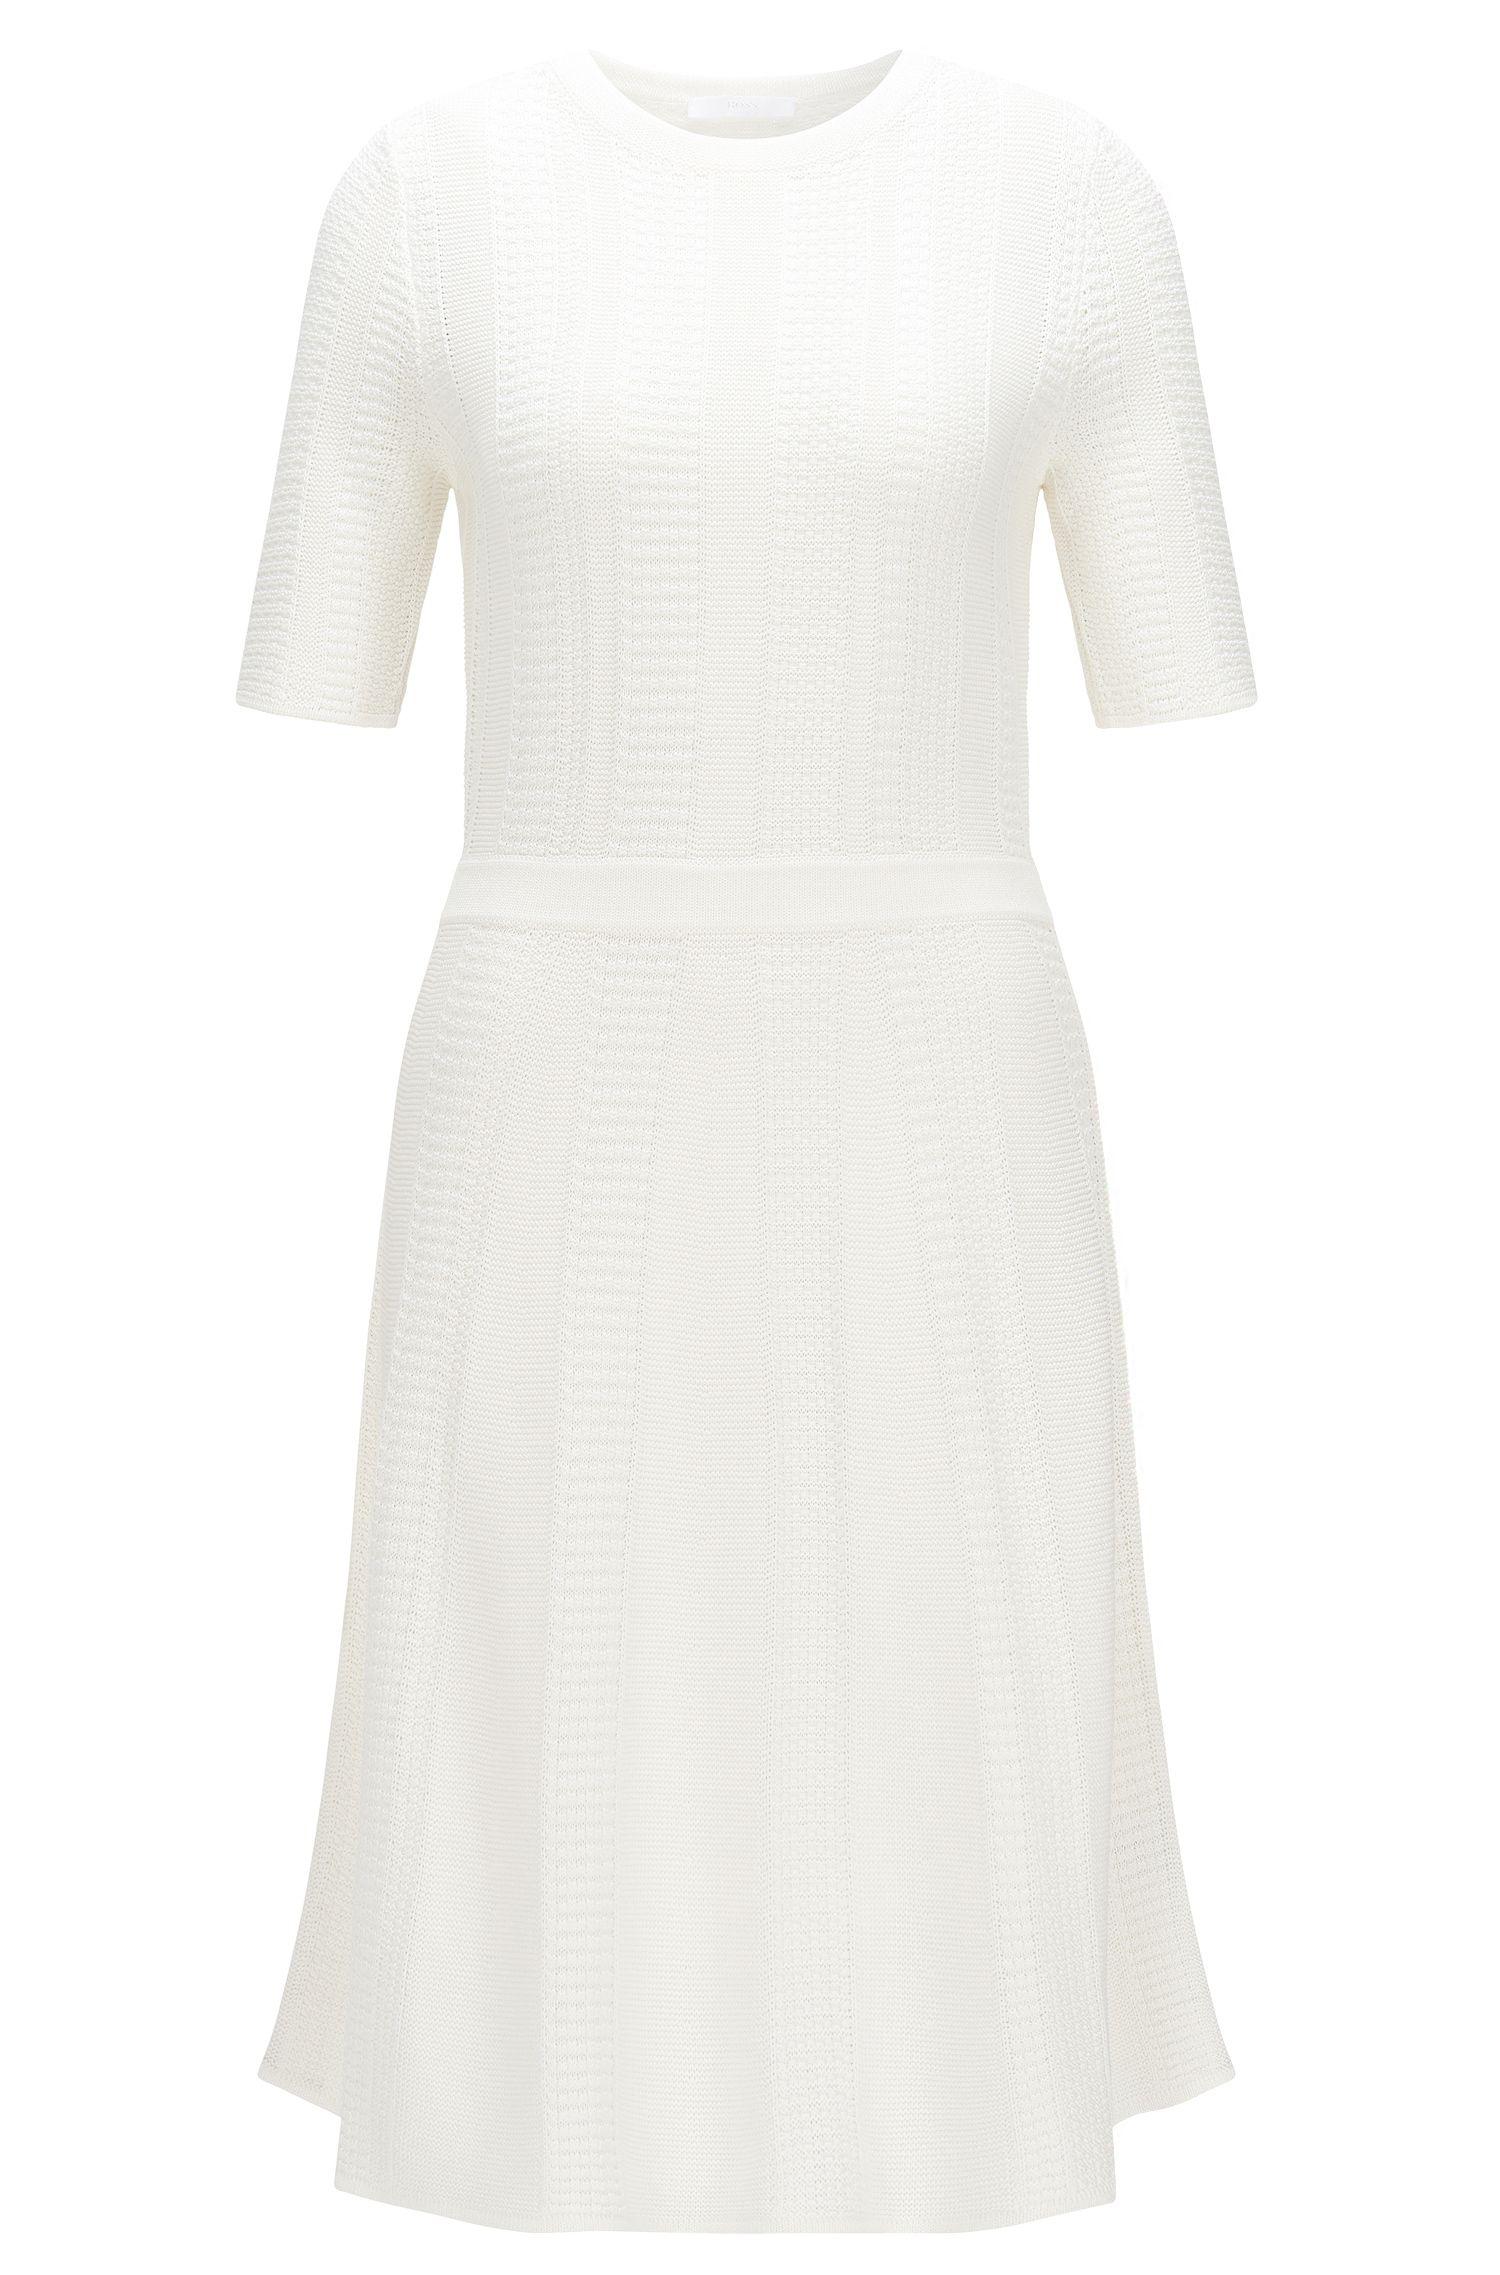 'Frizana' | A-Line Cotton Blend Sweater Dress